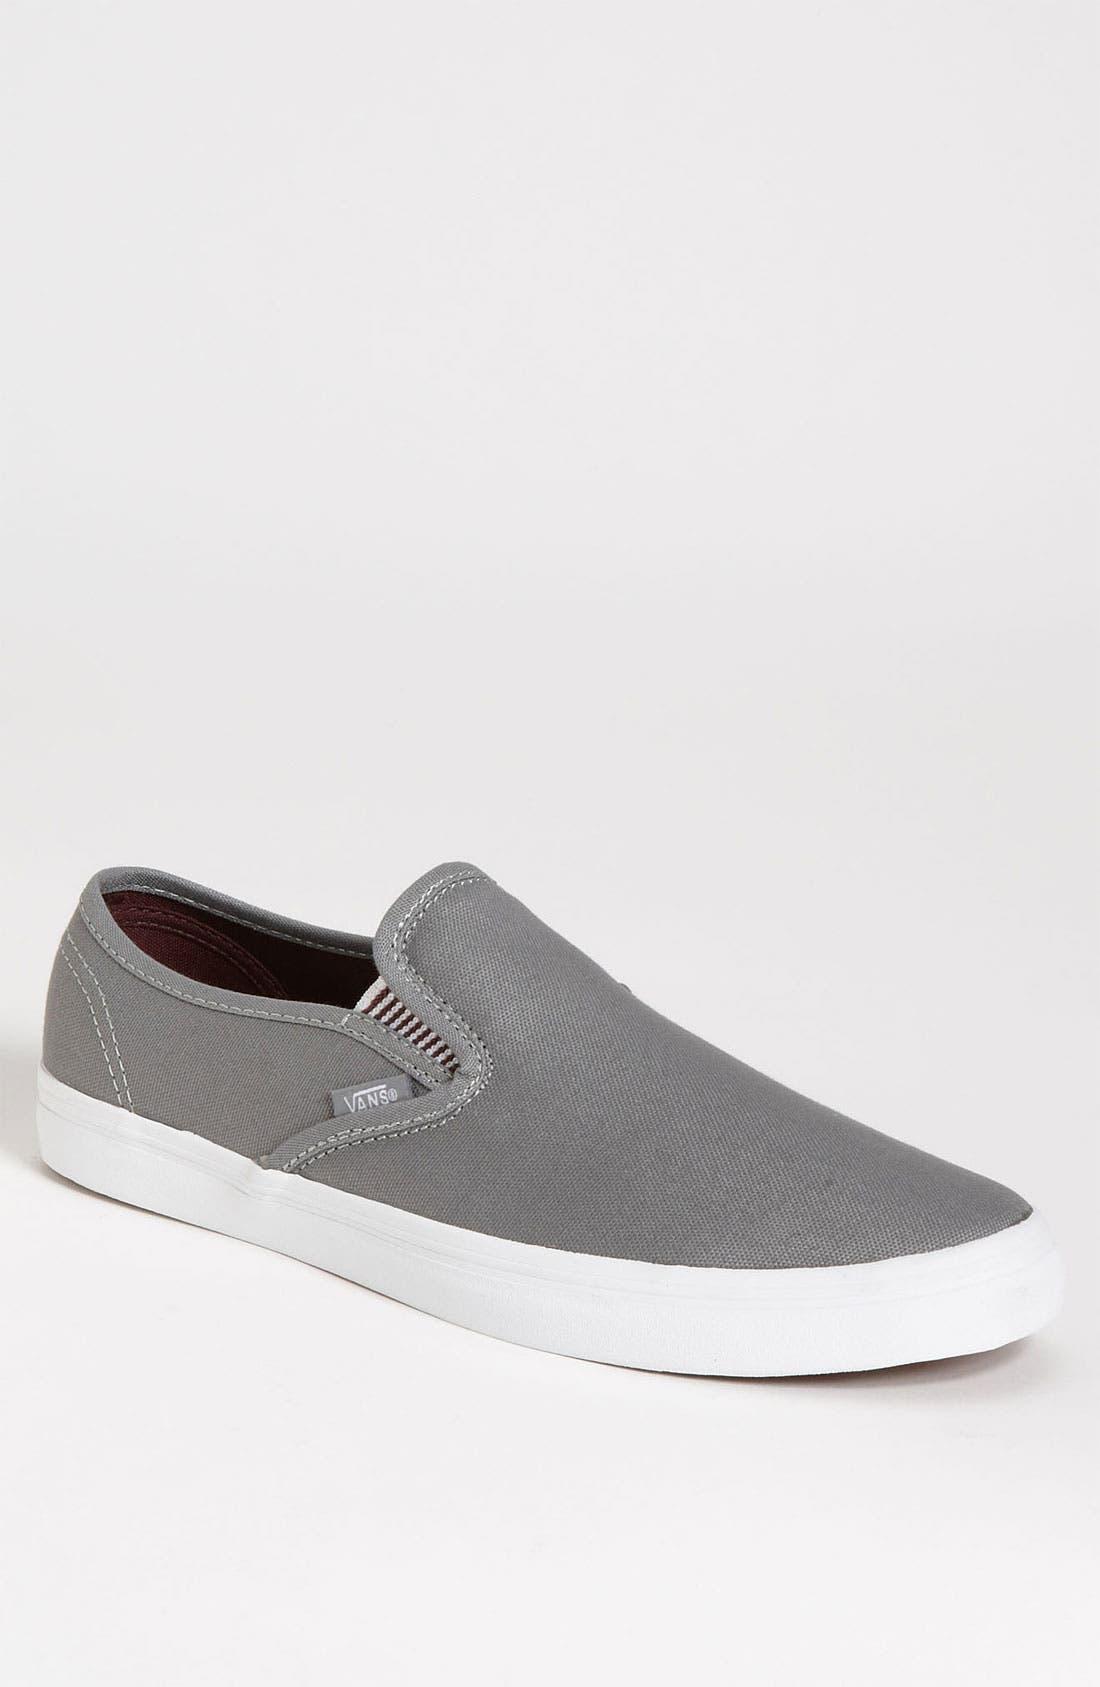 Alternate Image 1 Selected - Vans 'LP' Slip-On Sneaker (Men)